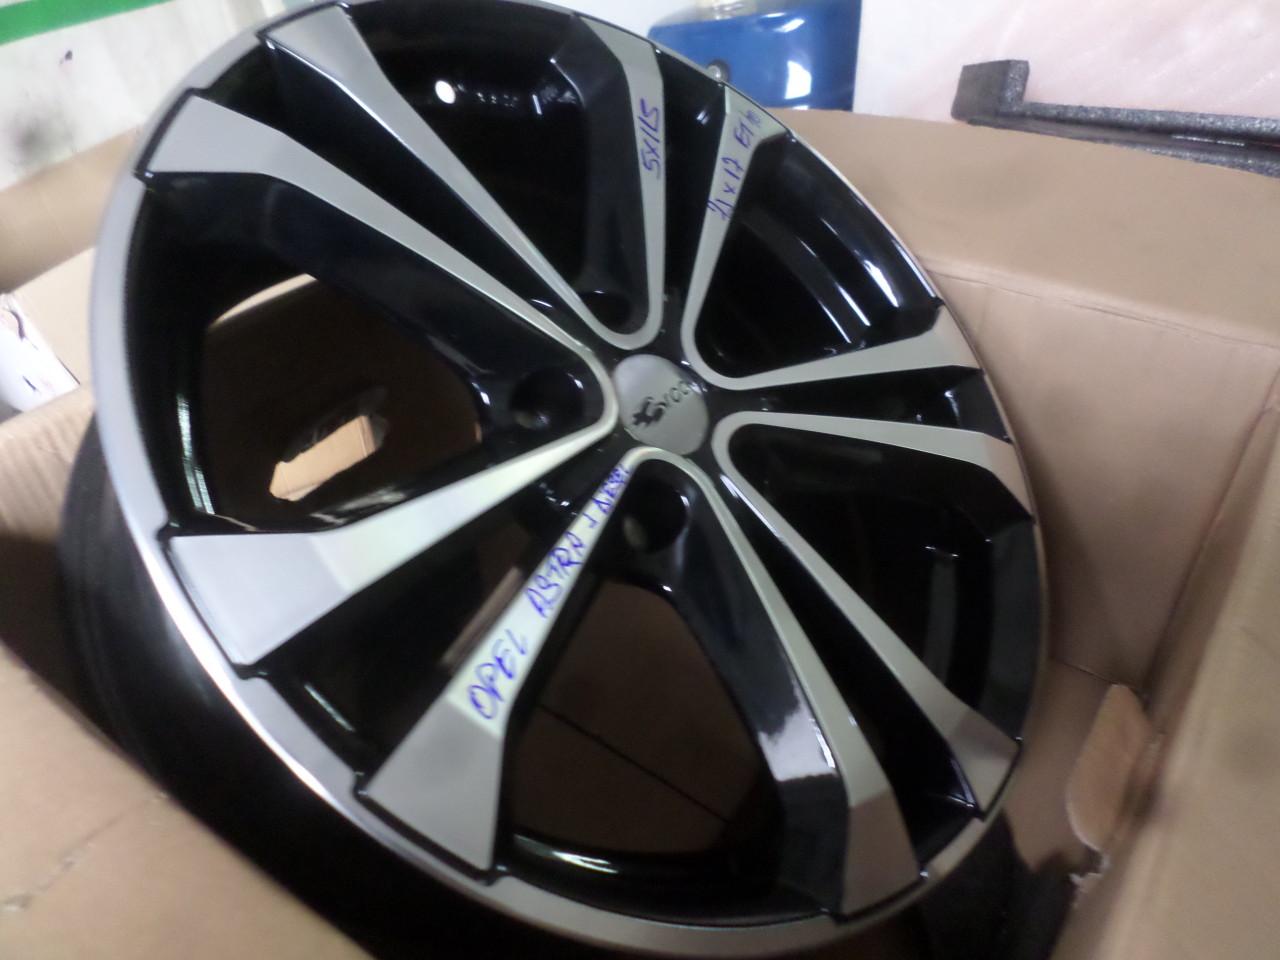 Jante Opel Astra J 5x115 NOI 17 zoll marca RC Design Rc 27